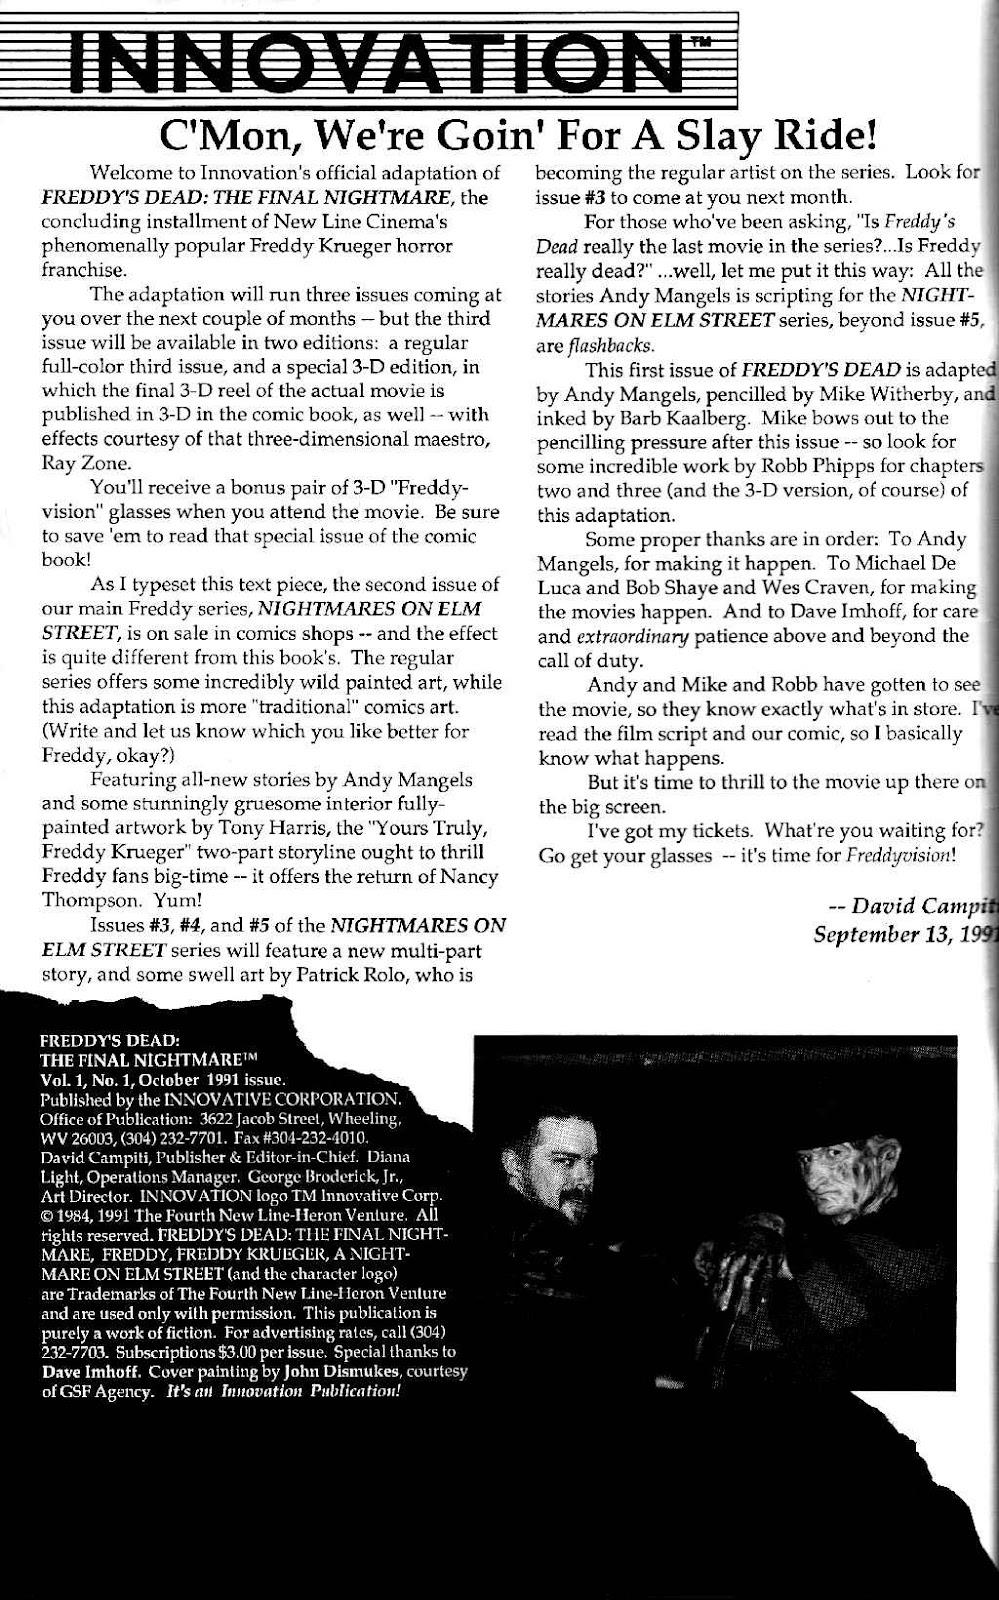 Read online Freddy's Dead: The Final Nightmare comic -  Issue #1 - 2